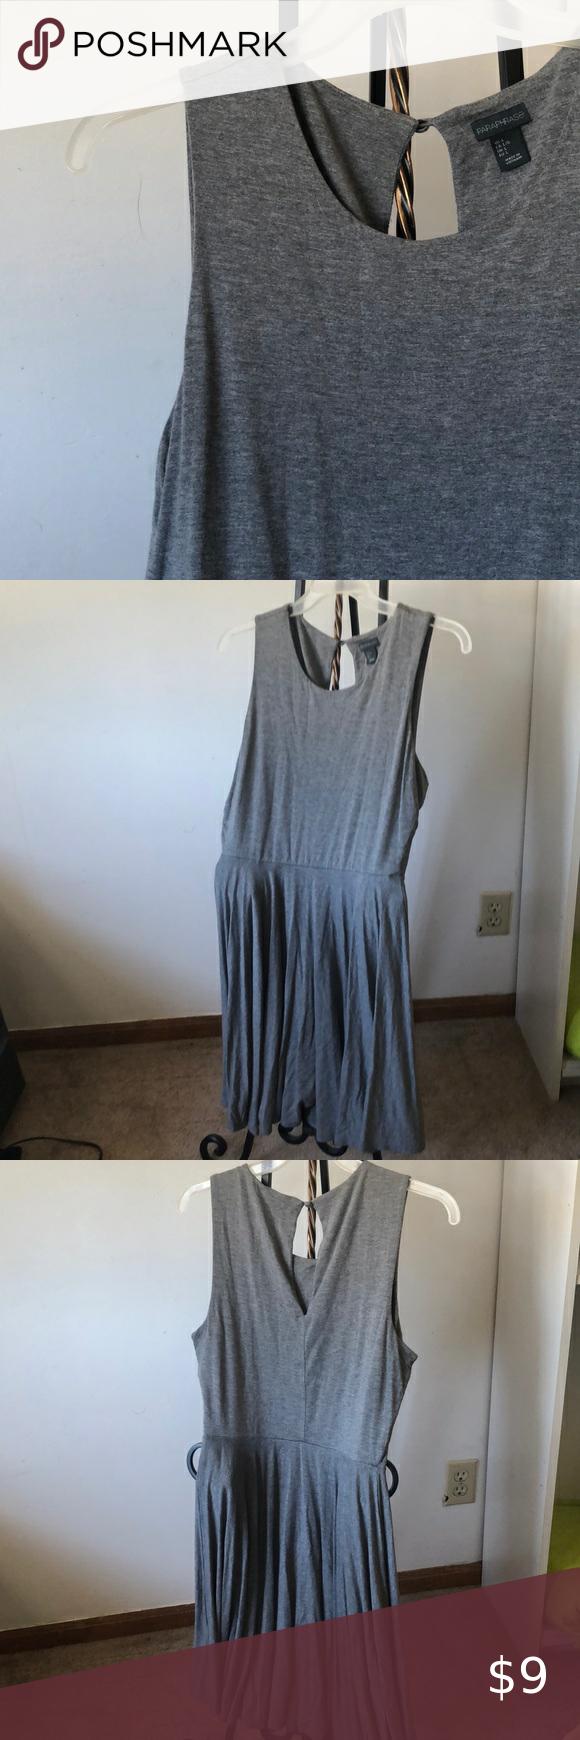 Pin On My Posh Picks Paraphrase Grey Dress Dres